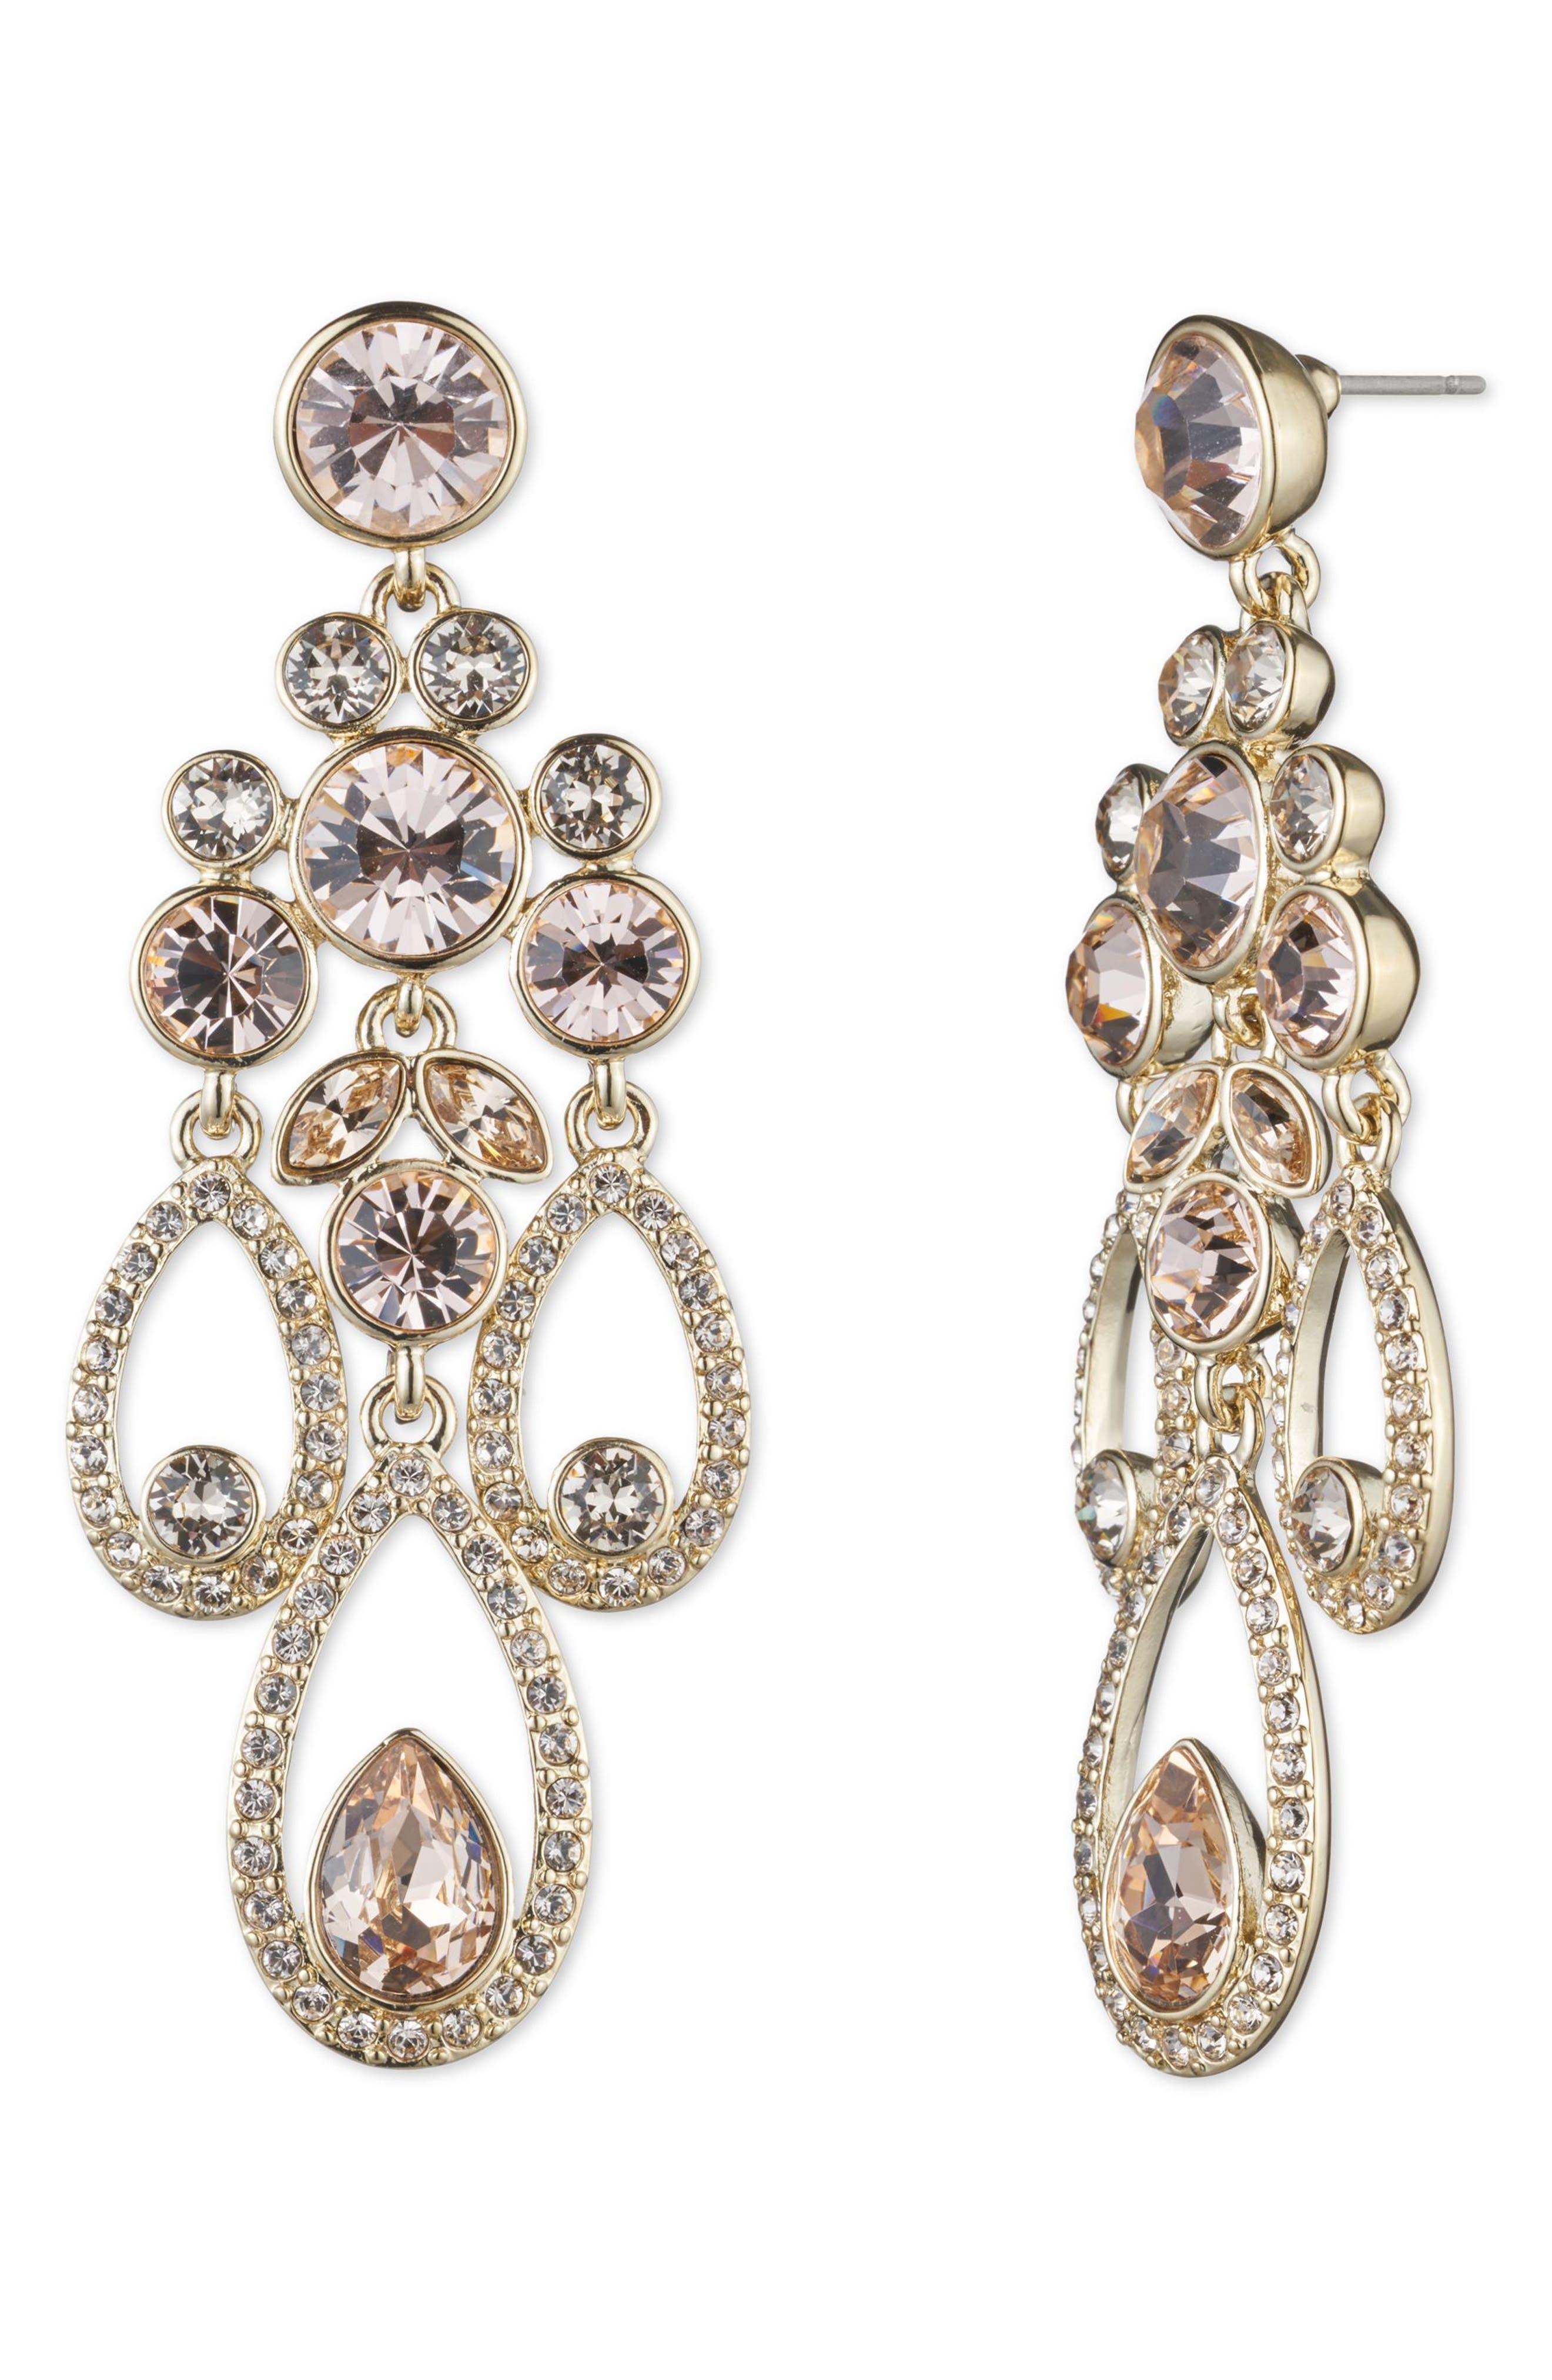 Drama Chandelier Crystal Earrings,                             Main thumbnail 1, color,                             710